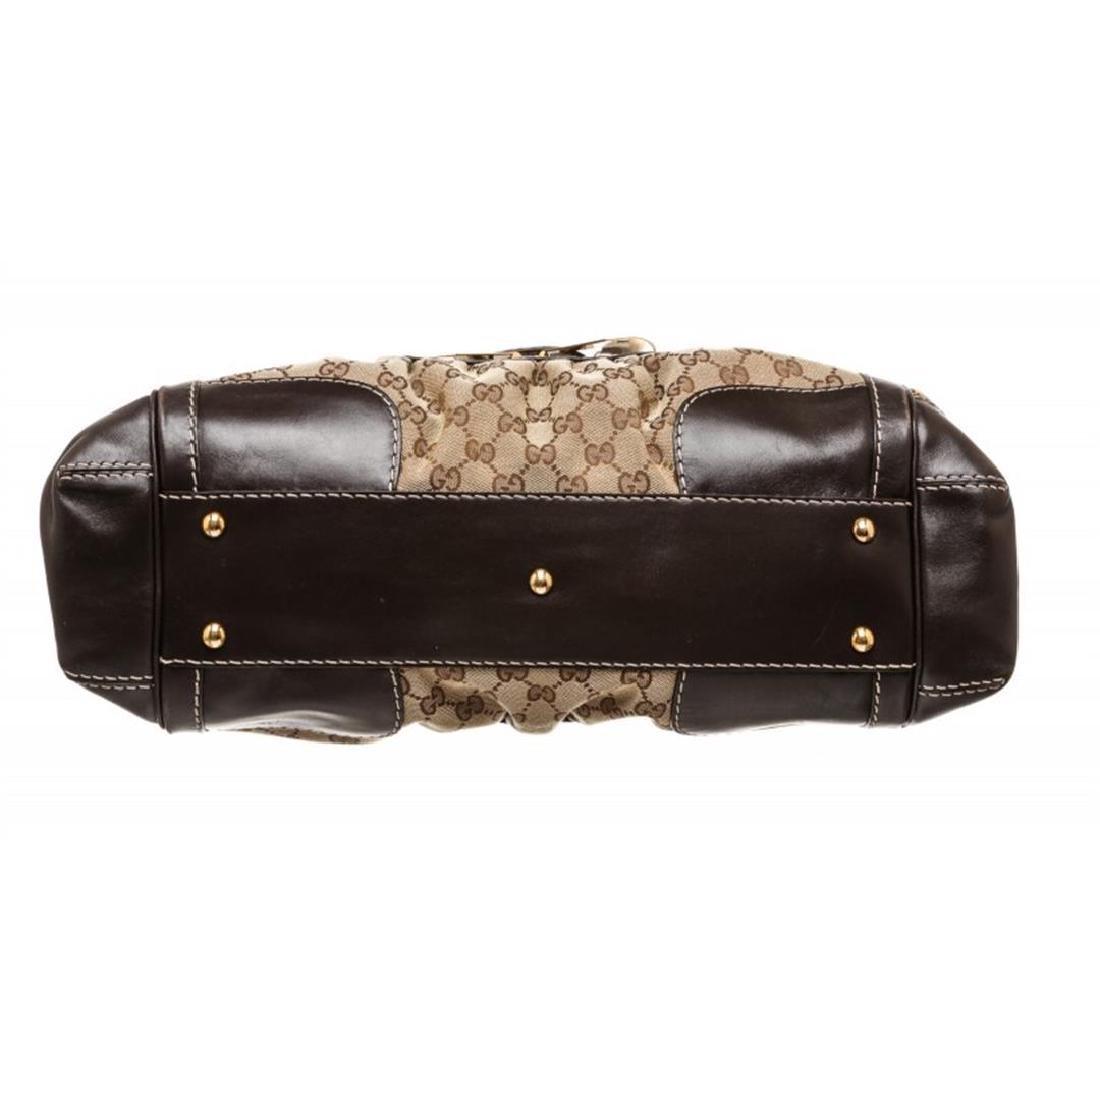 Gucci Beige Canvas Monogram Brown Leather Dialux Queen - 4